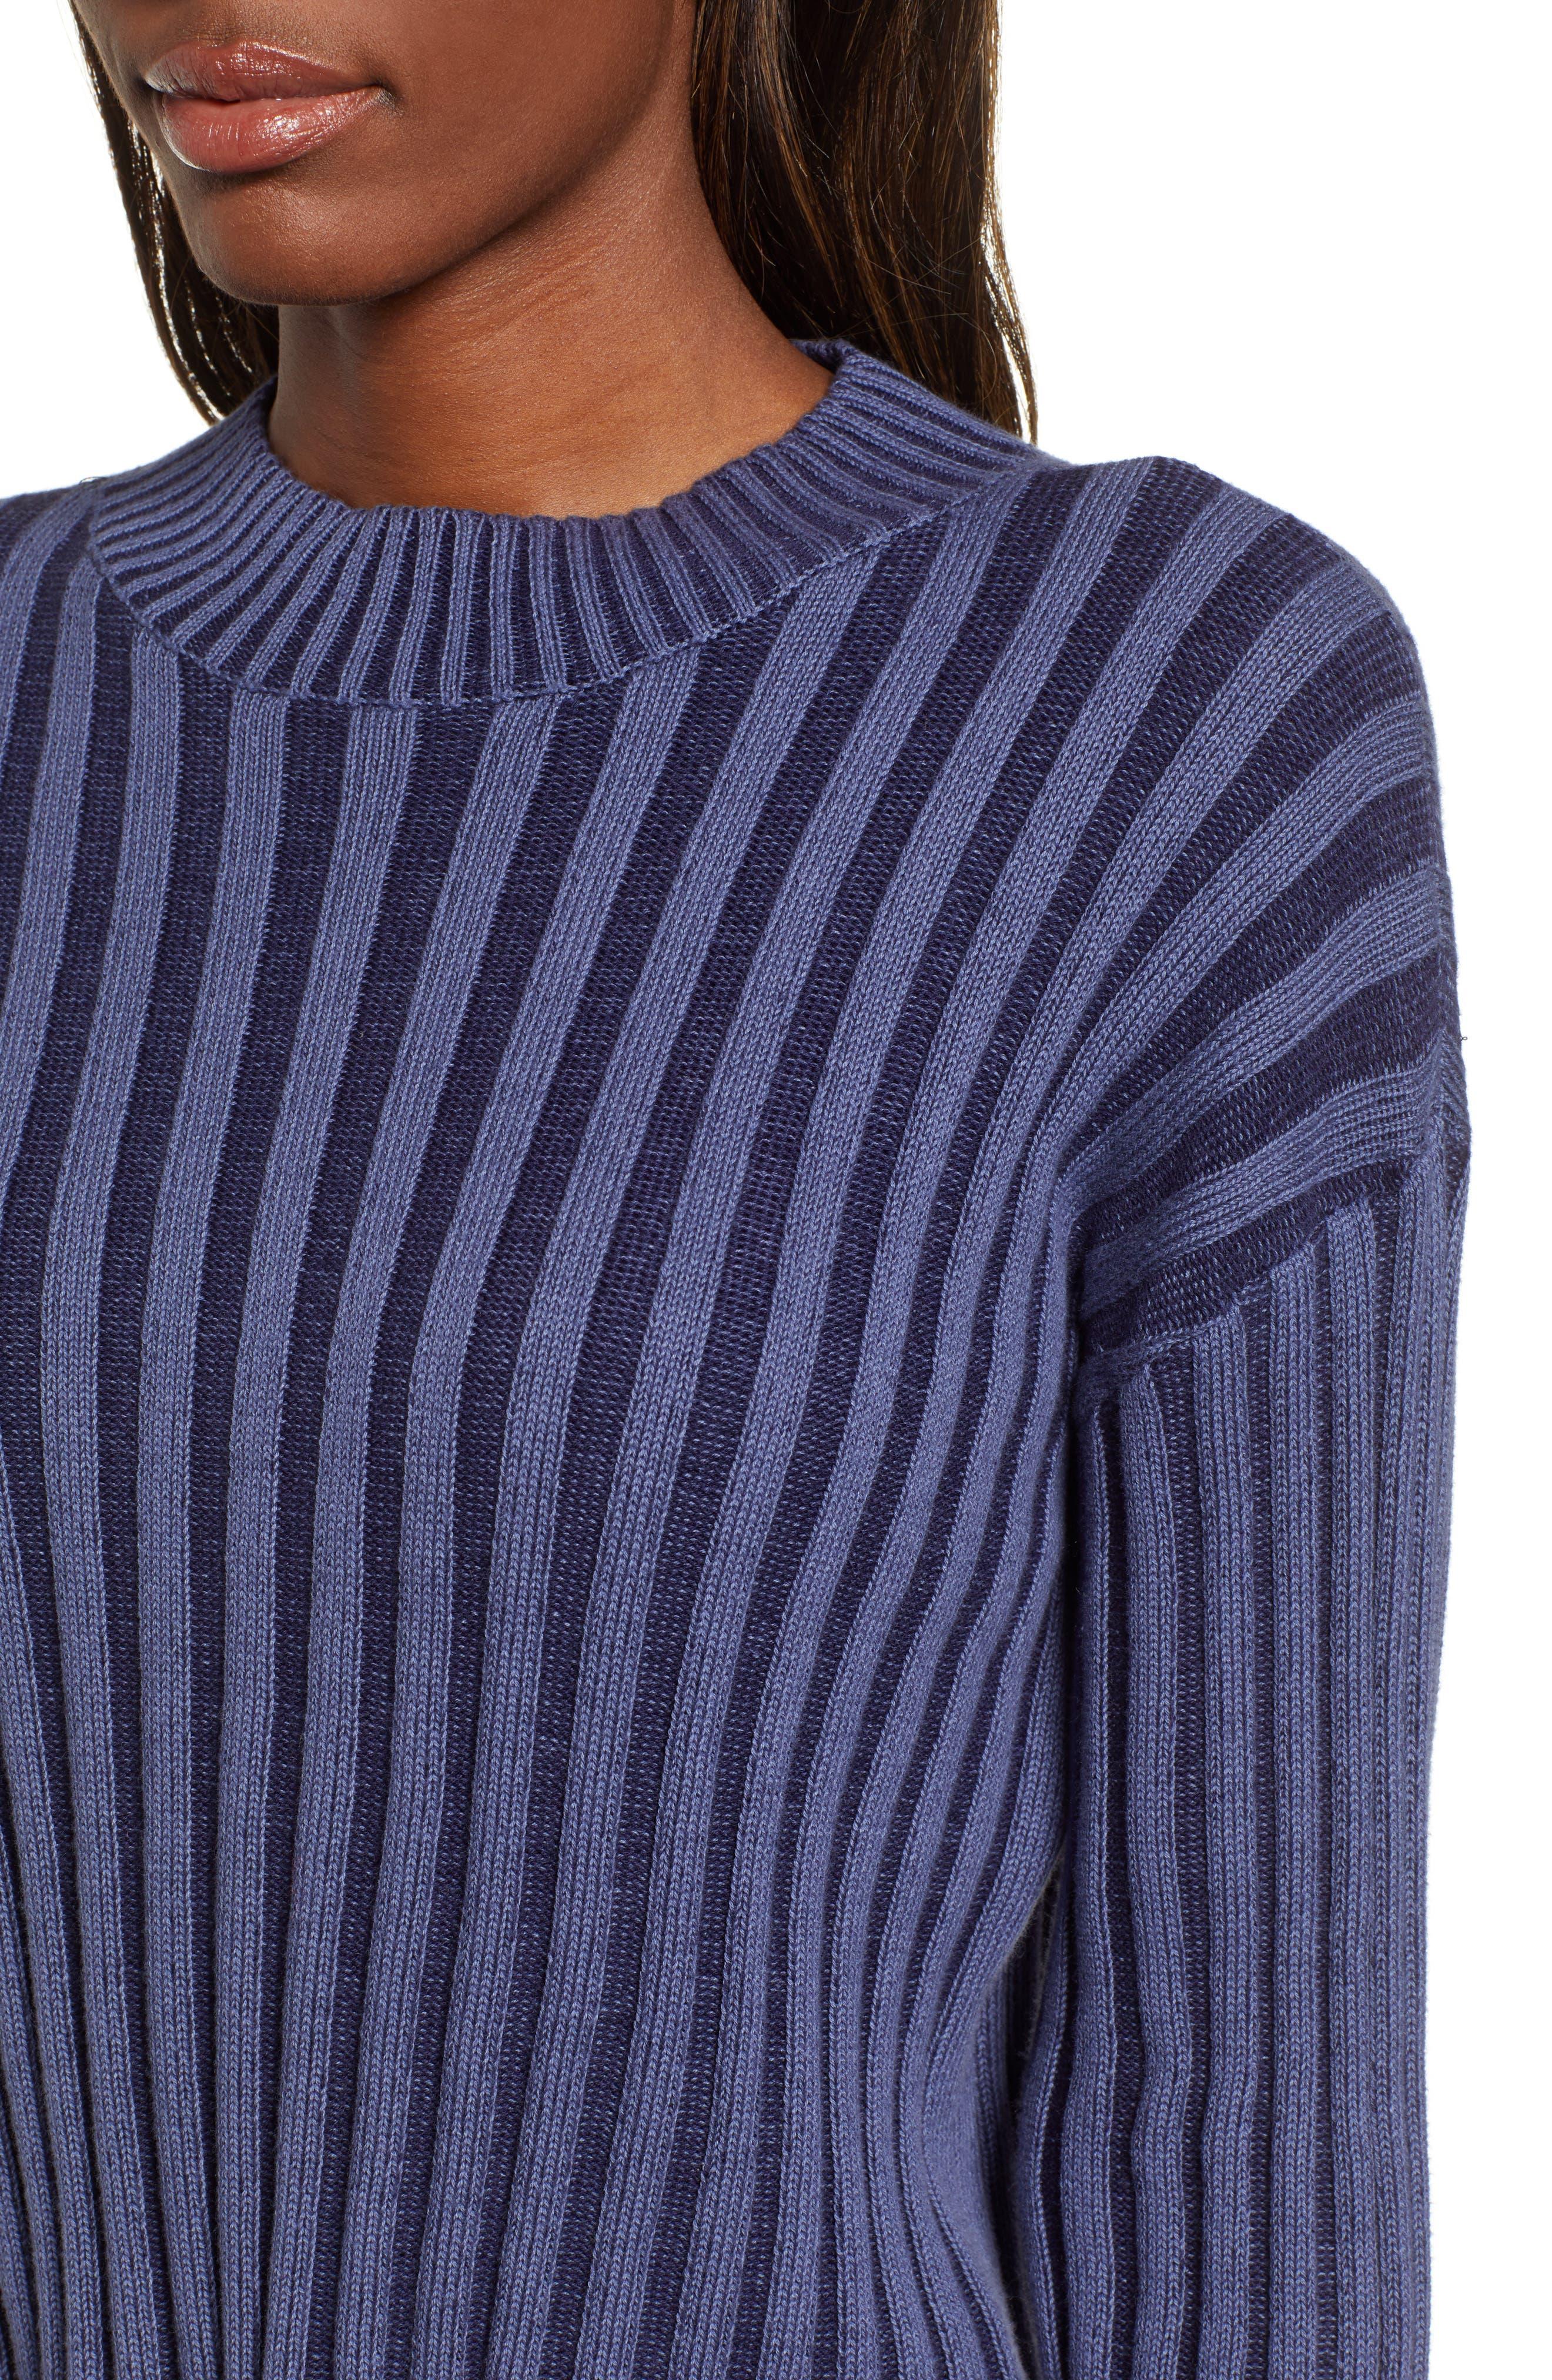 Shadow Rib Crop Sweater,                             Alternate thumbnail 5, color,                             NAVY EVENING